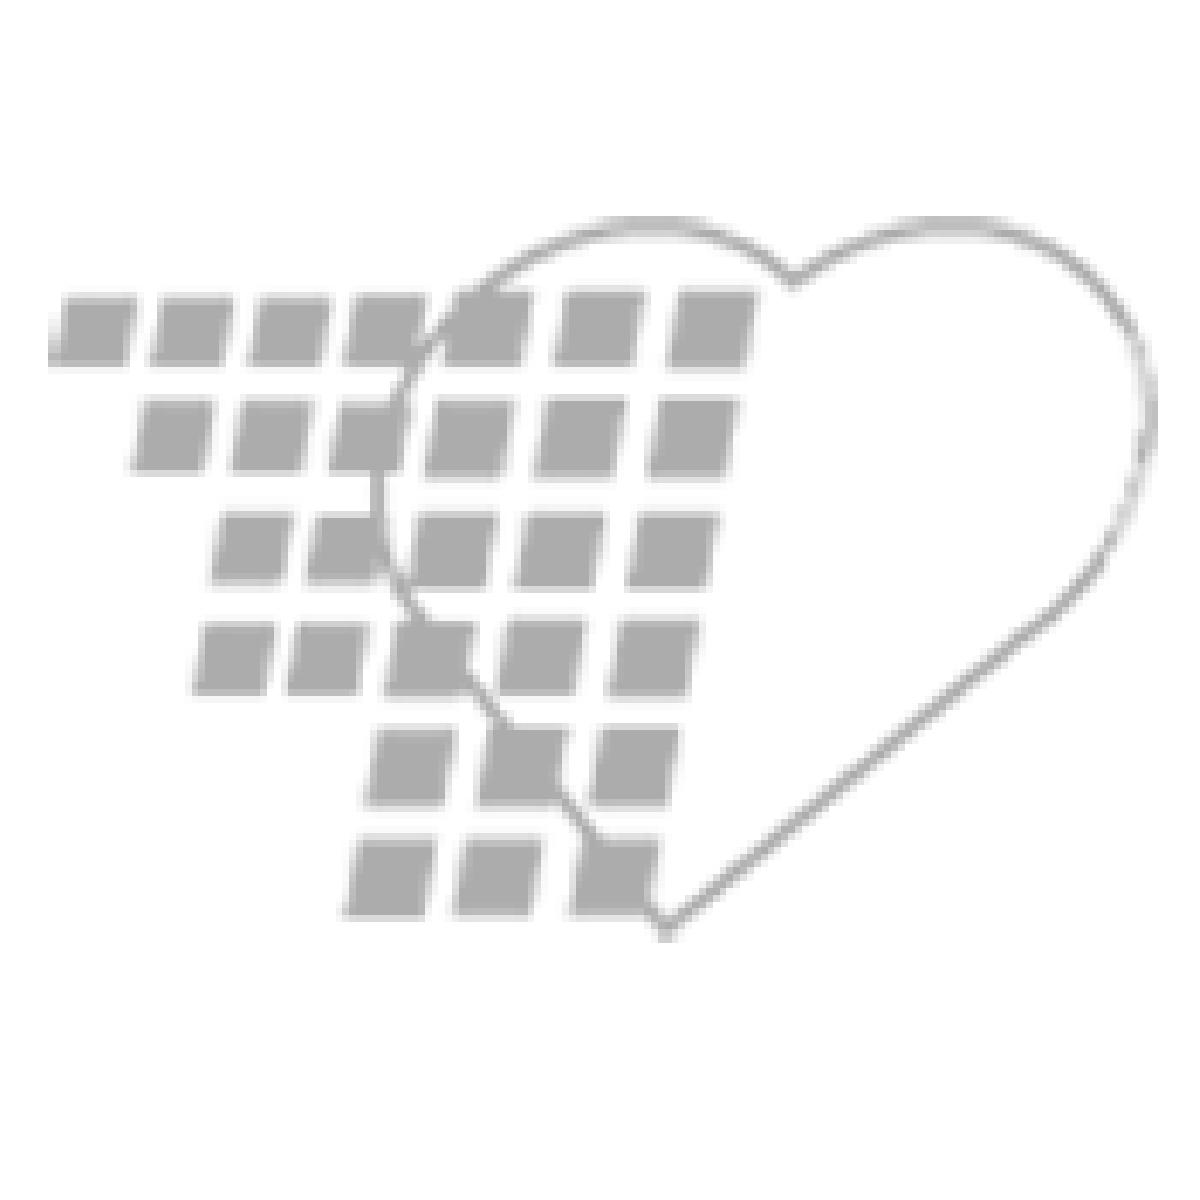 08-02-31 BD™ E-Z Scrub™ Preoperative Surgical Scrub Brush 205 with Povidone Iodine